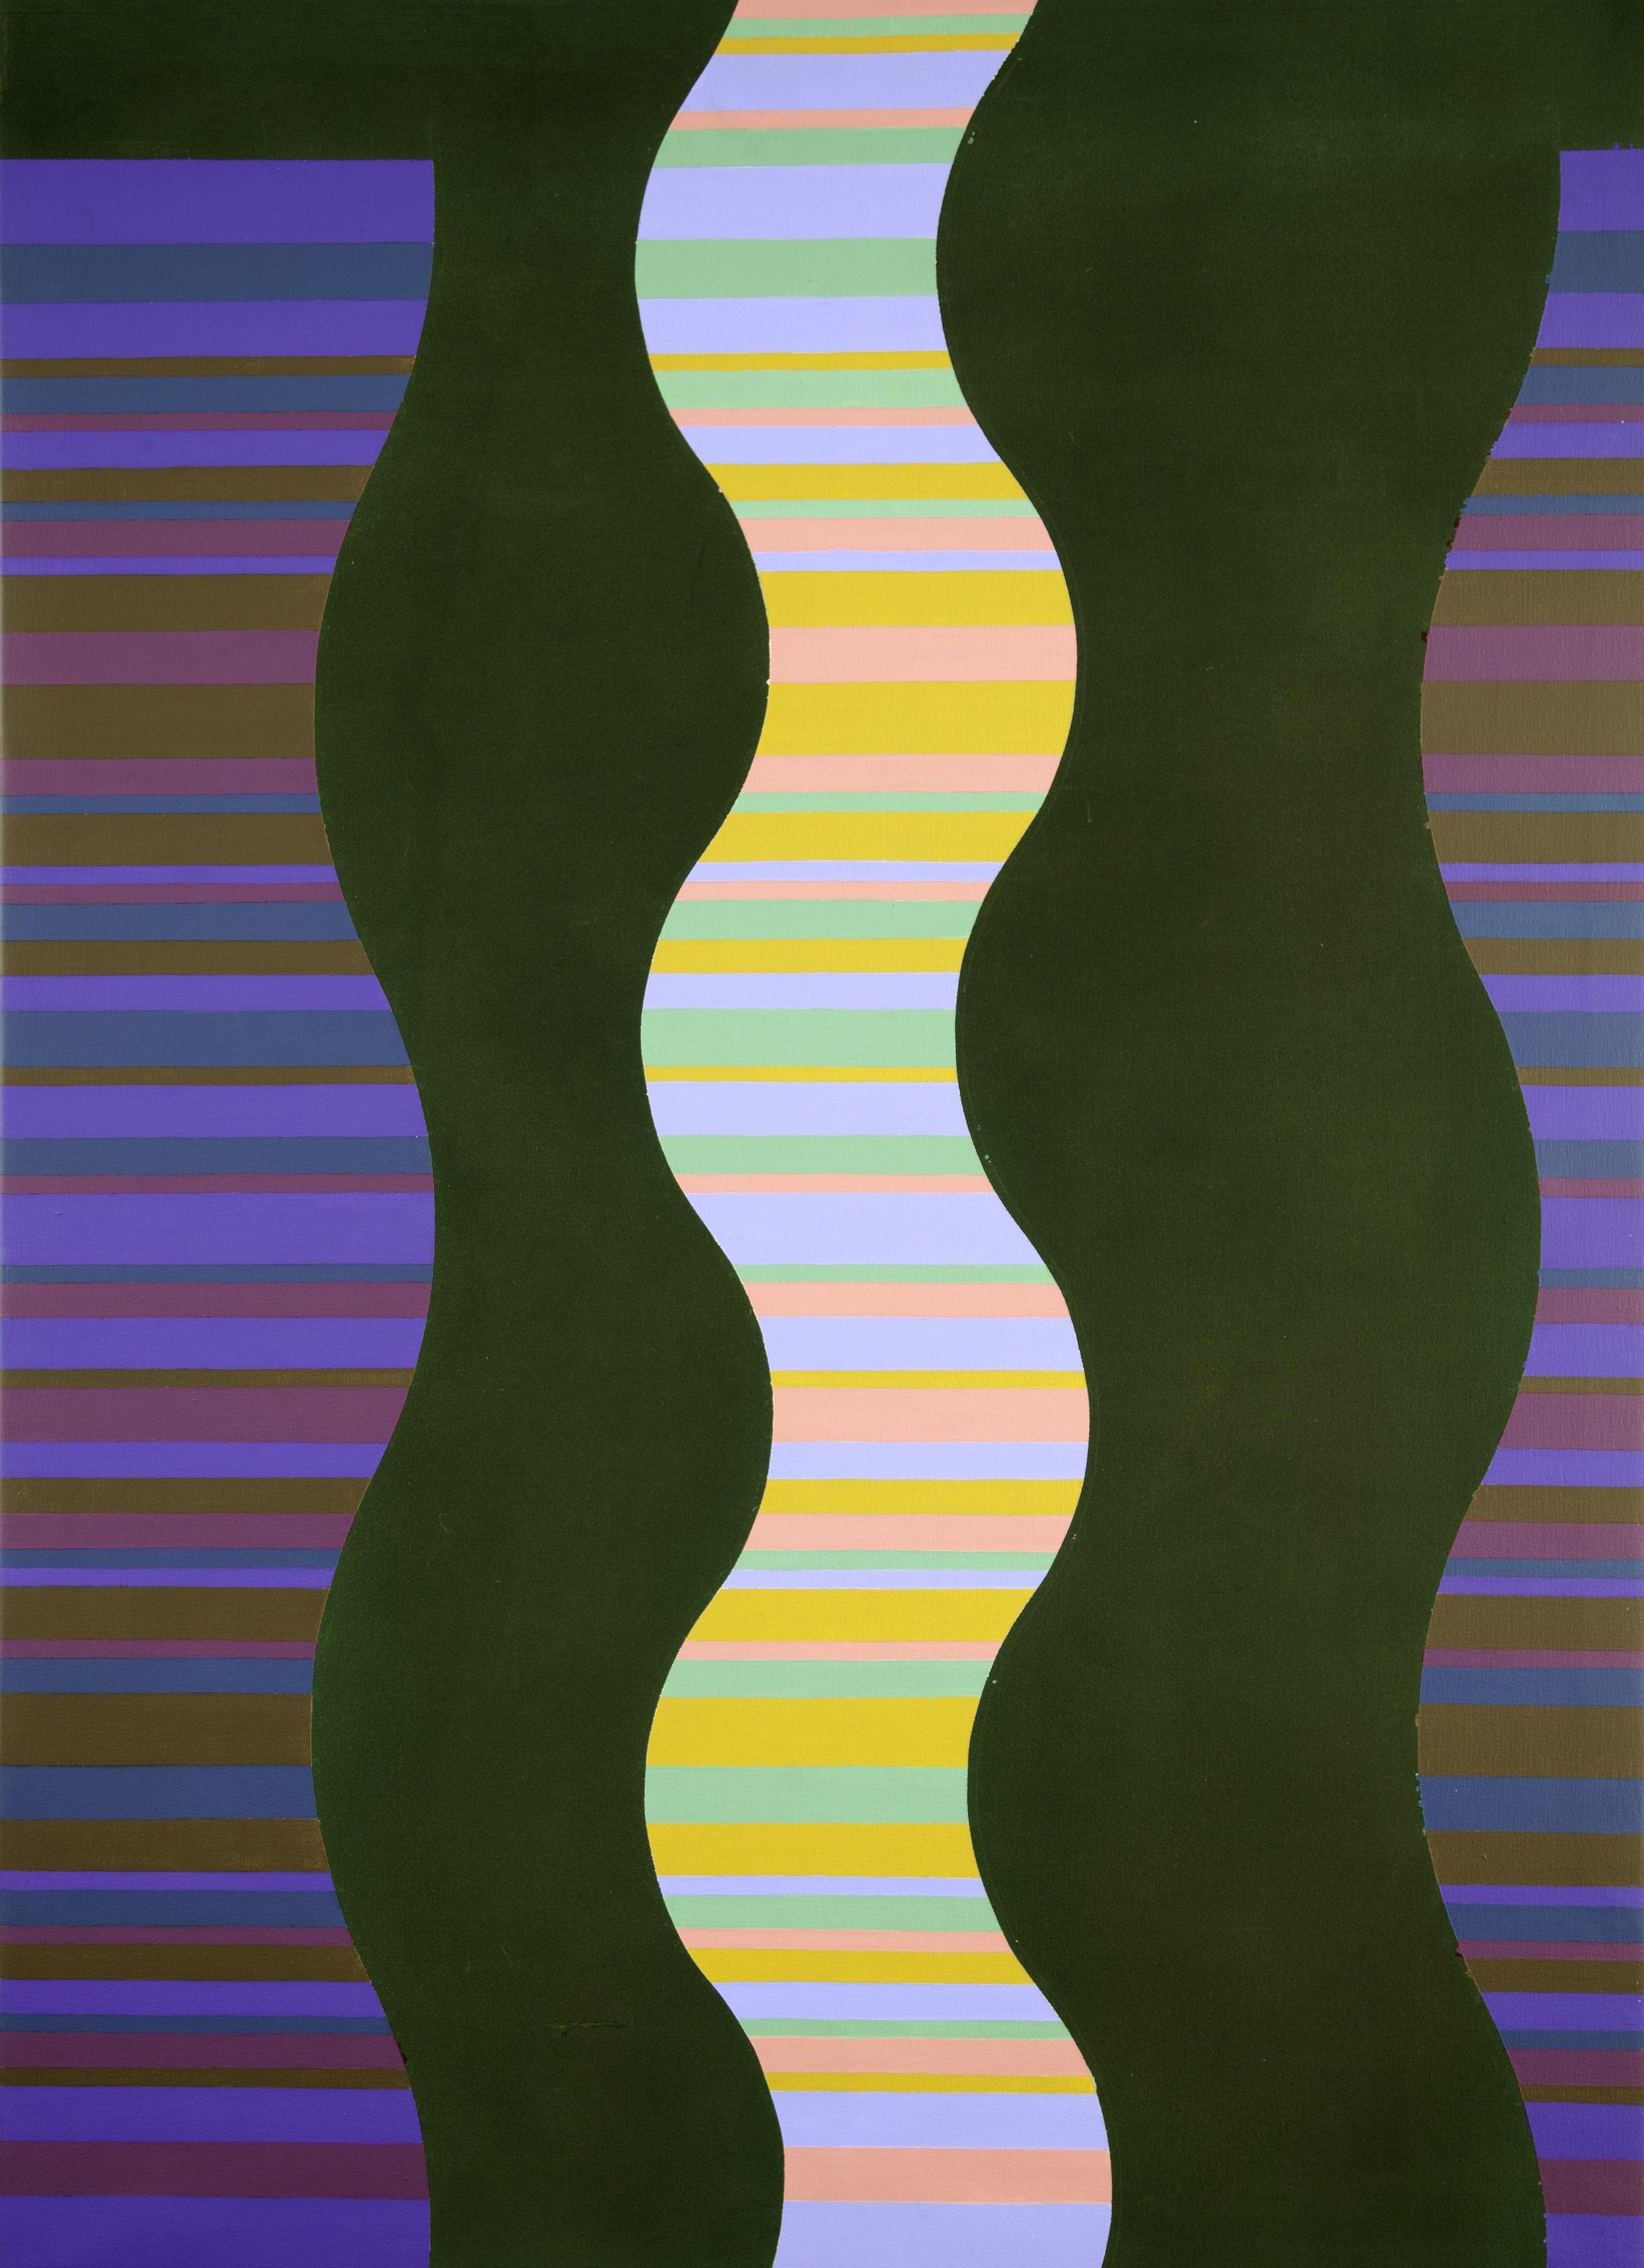 Michael Kidner (1917–2009)   Green (For Grabowski) , 1968 acrylic on cotton duck  66 1/4 x 48 in. (168.3 x 121.9 cm) LSFA# 14066